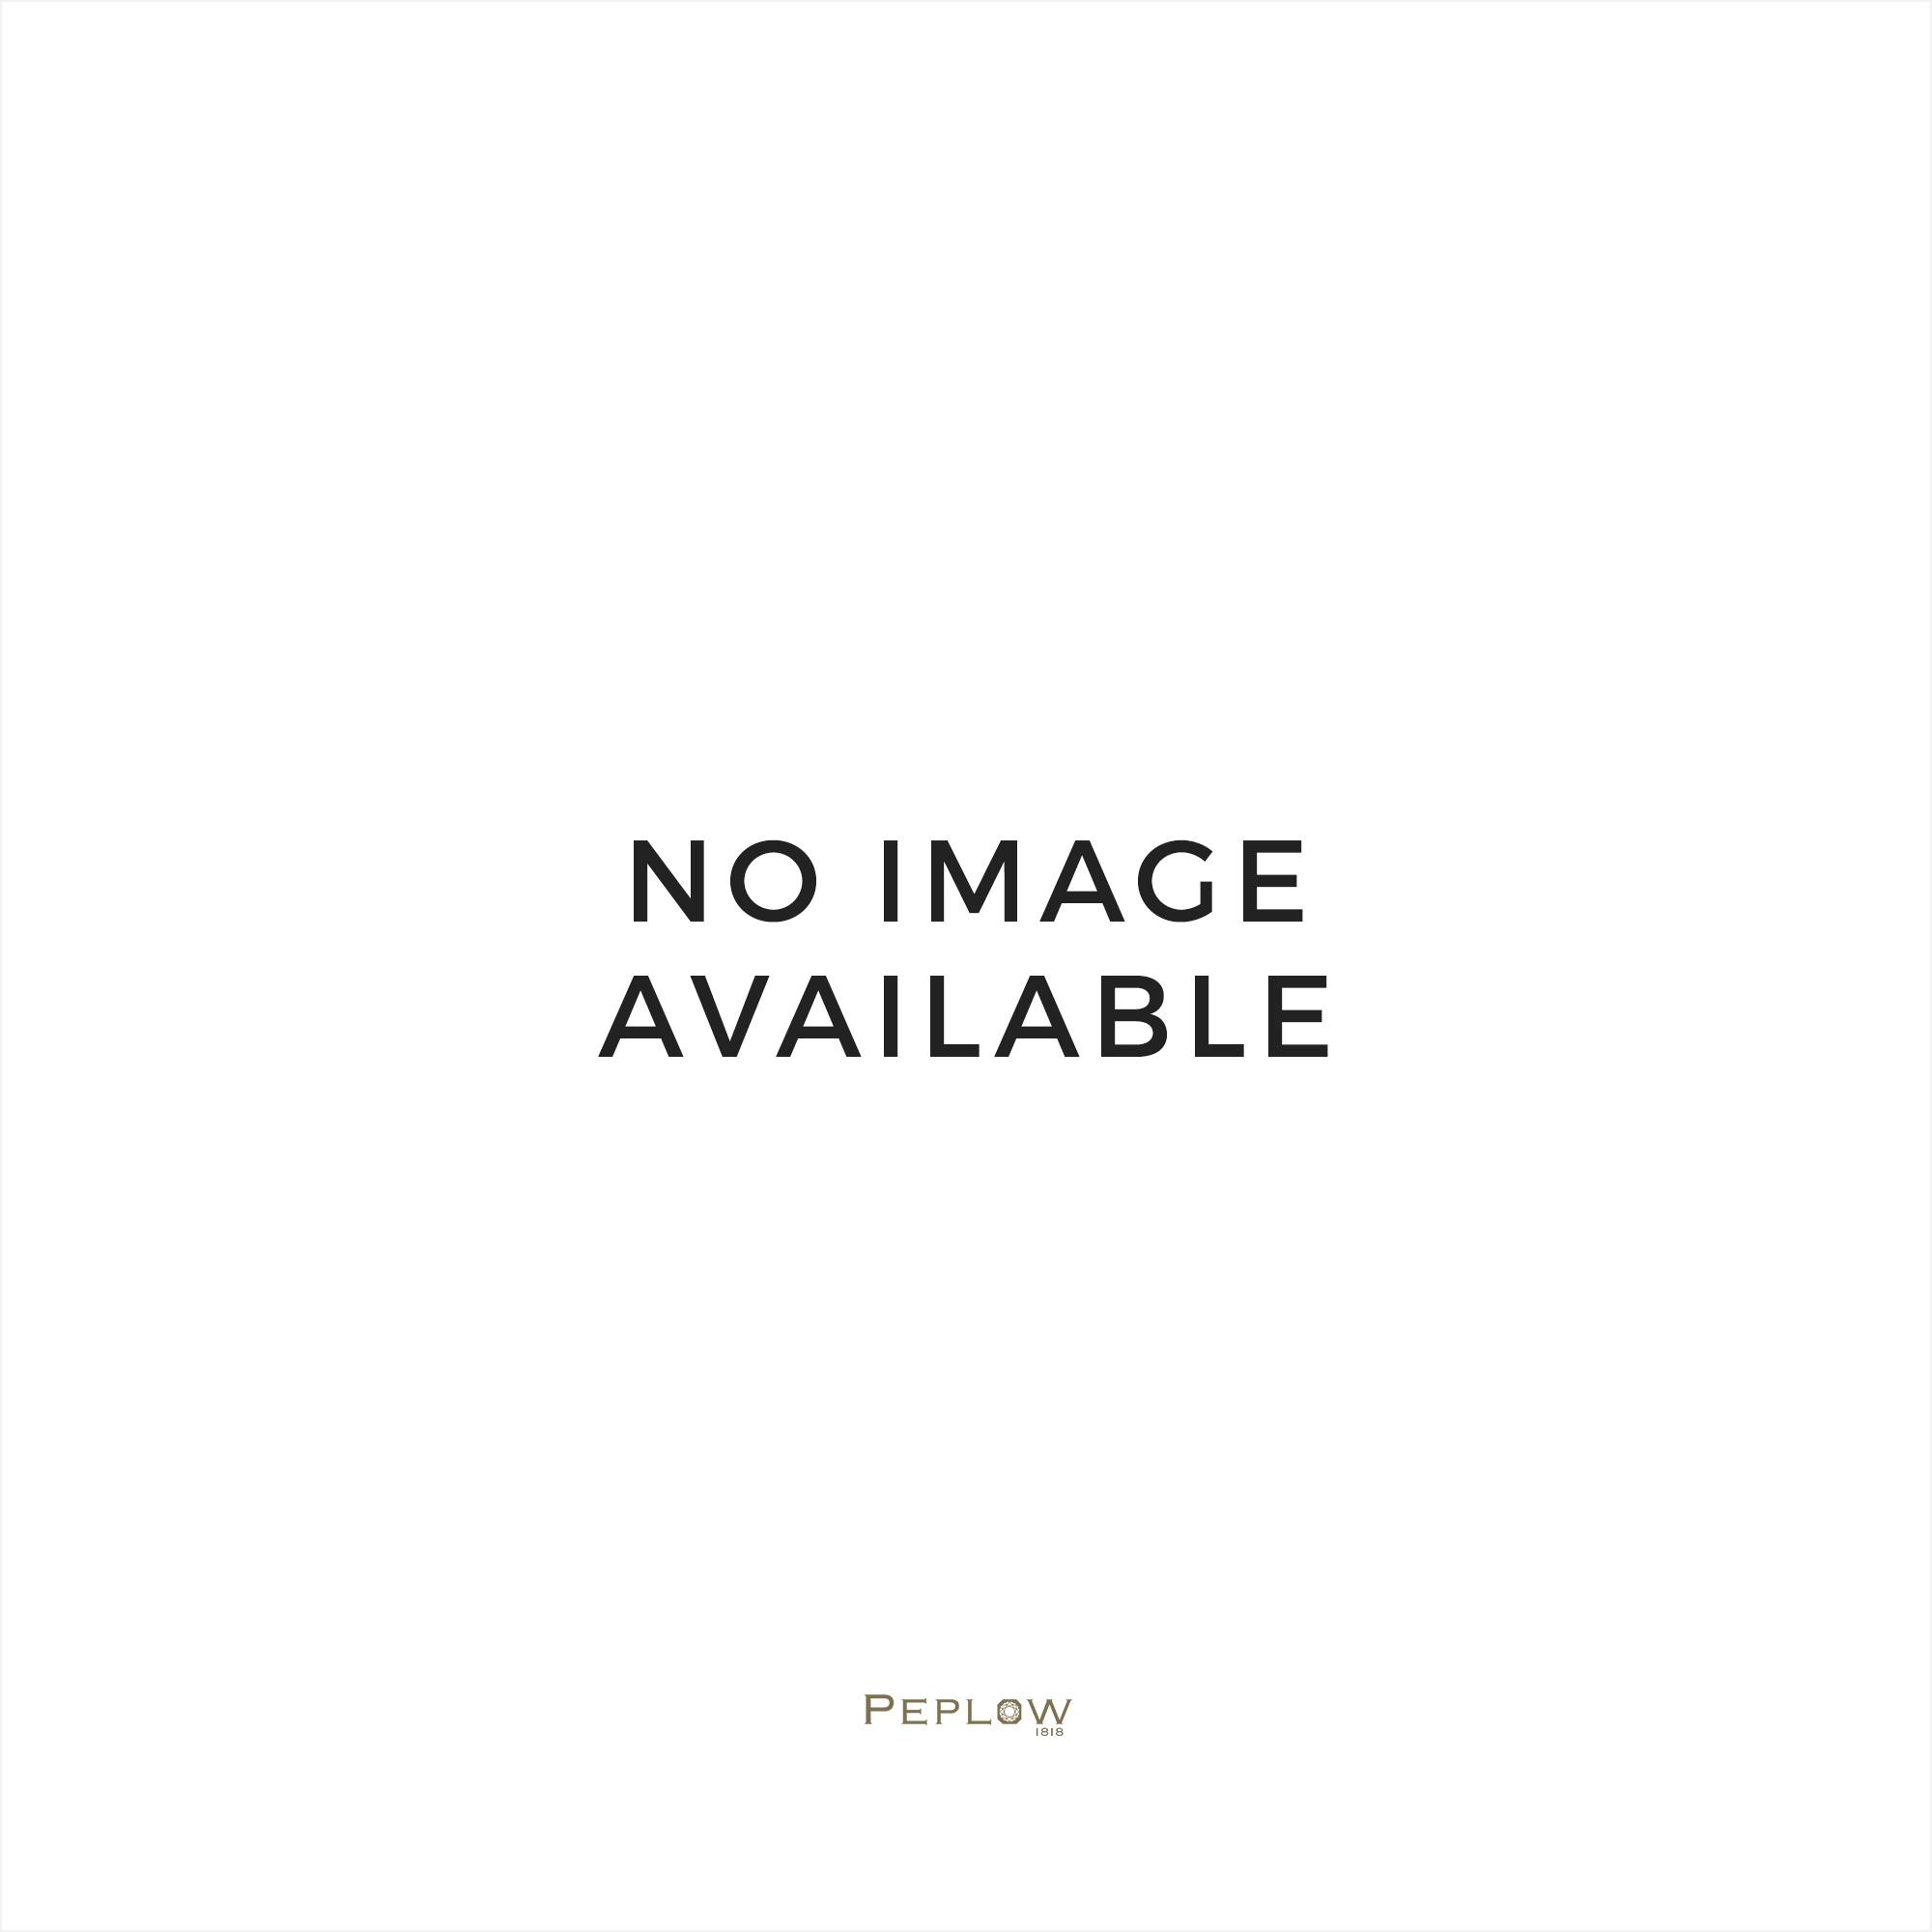 Mens Palladium Satin and Polished Wedding Ring 6mm